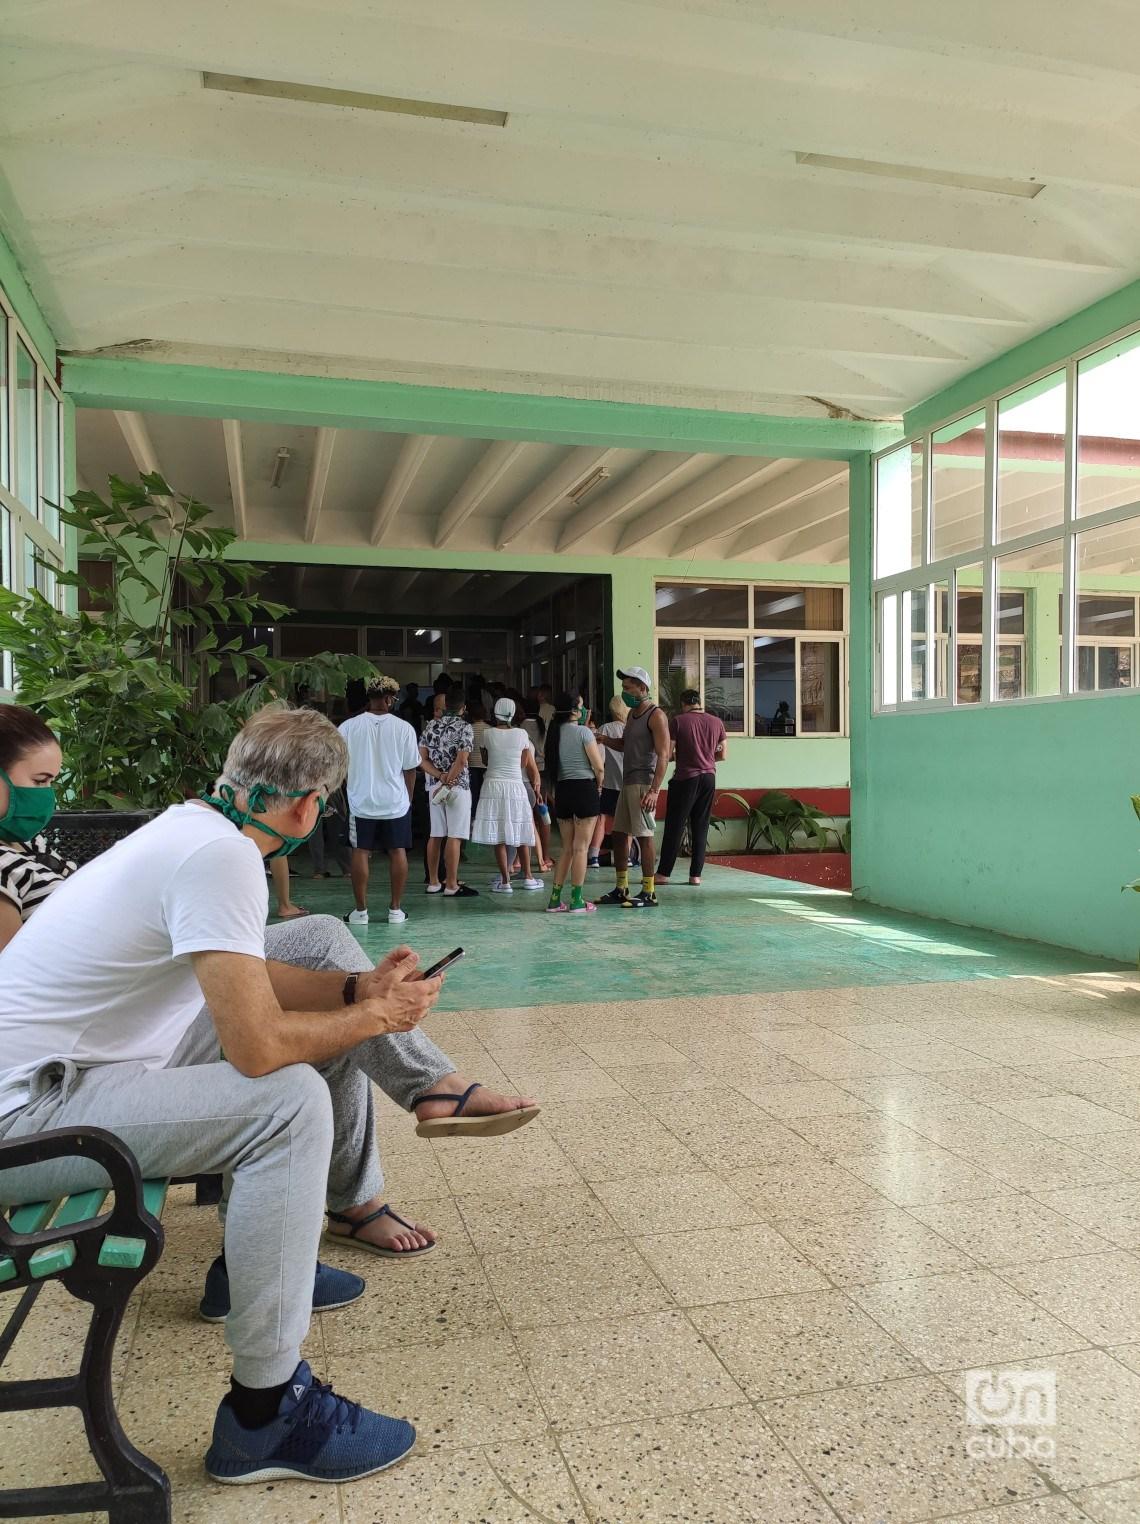 Esperando para entrar al comedor. Foto: Mónica Rivero.